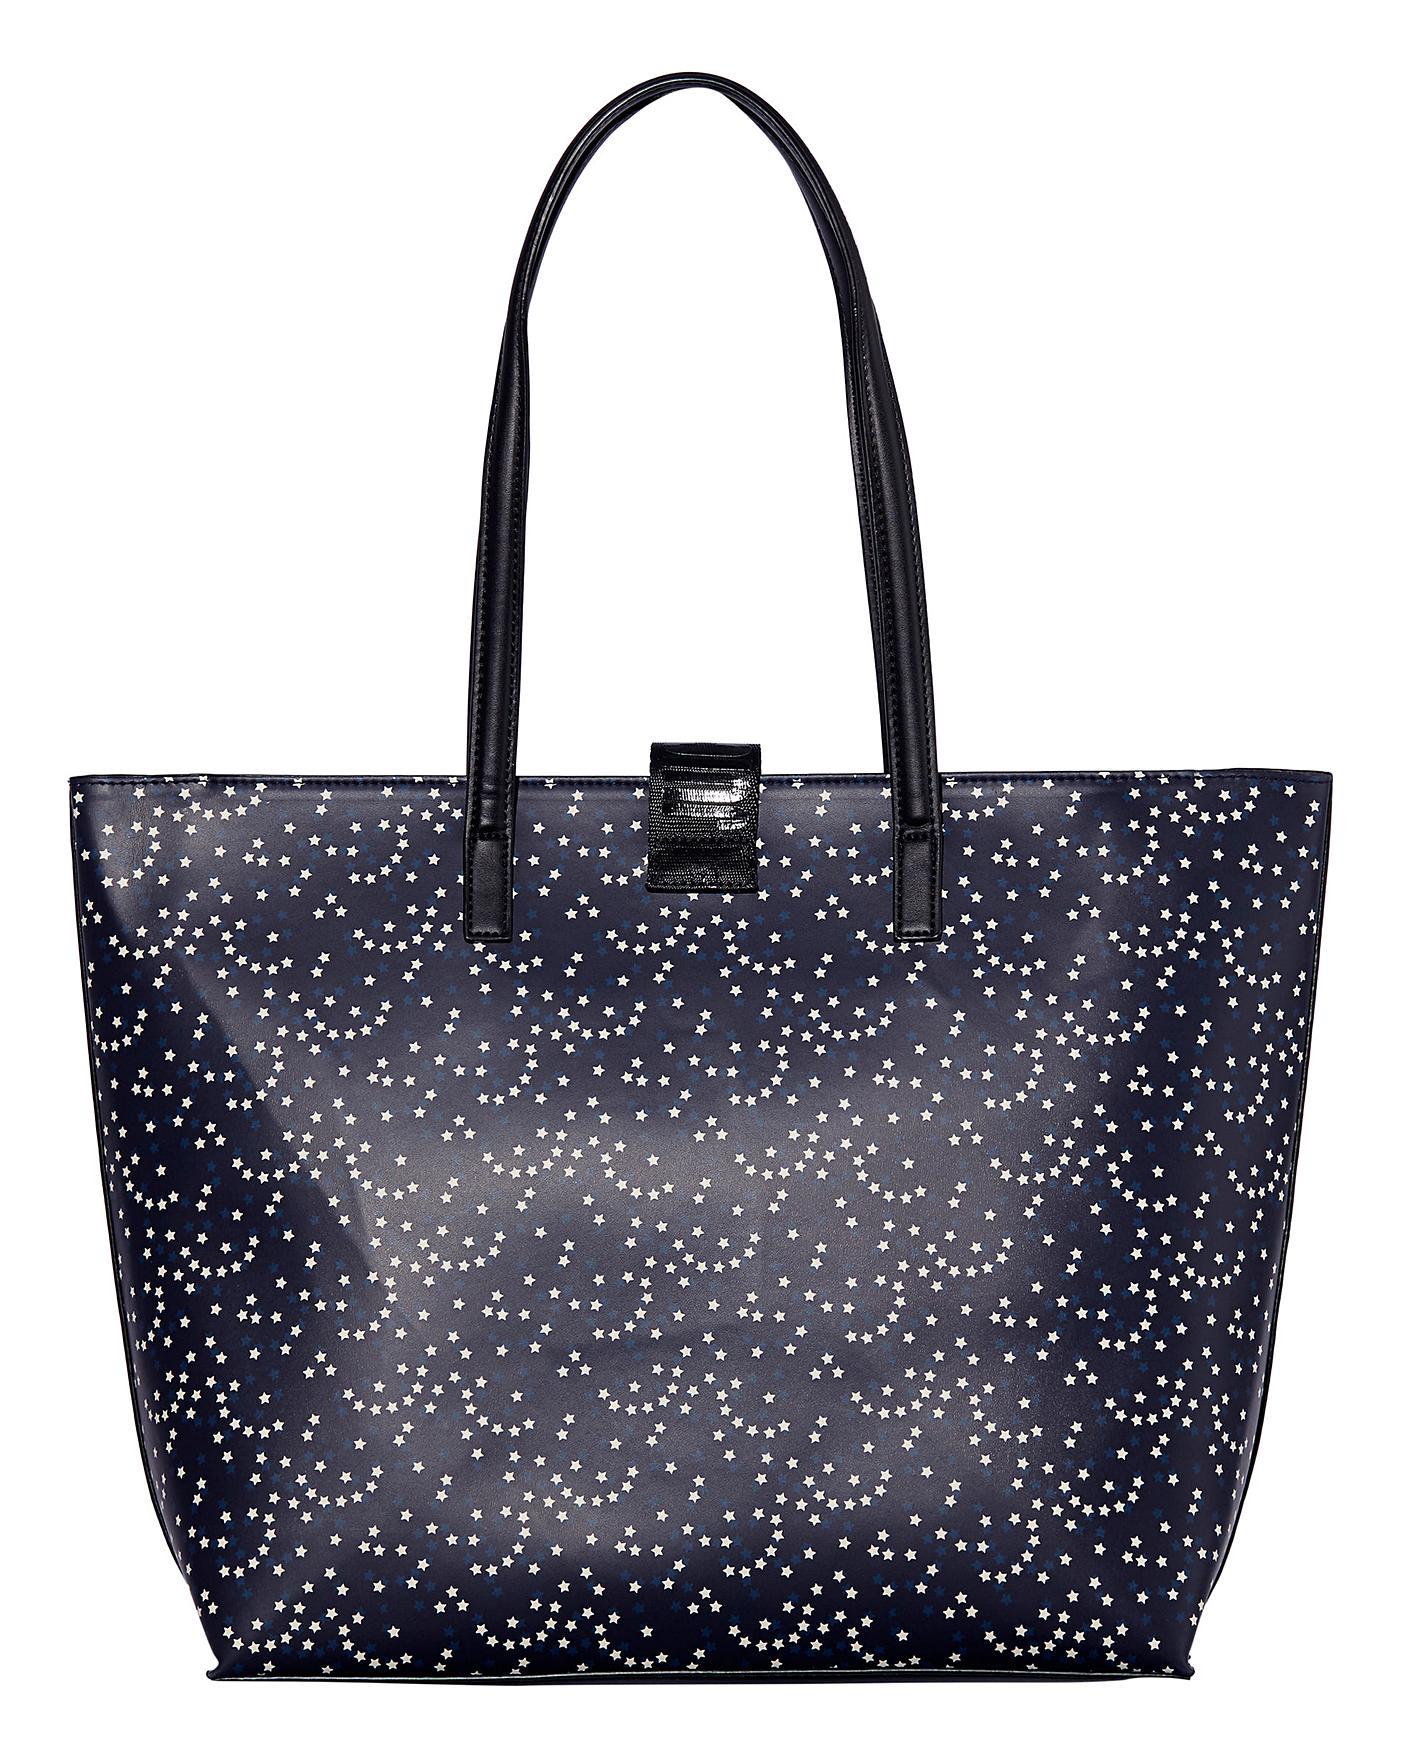 Juicy Couture Tote Bag J D Williams